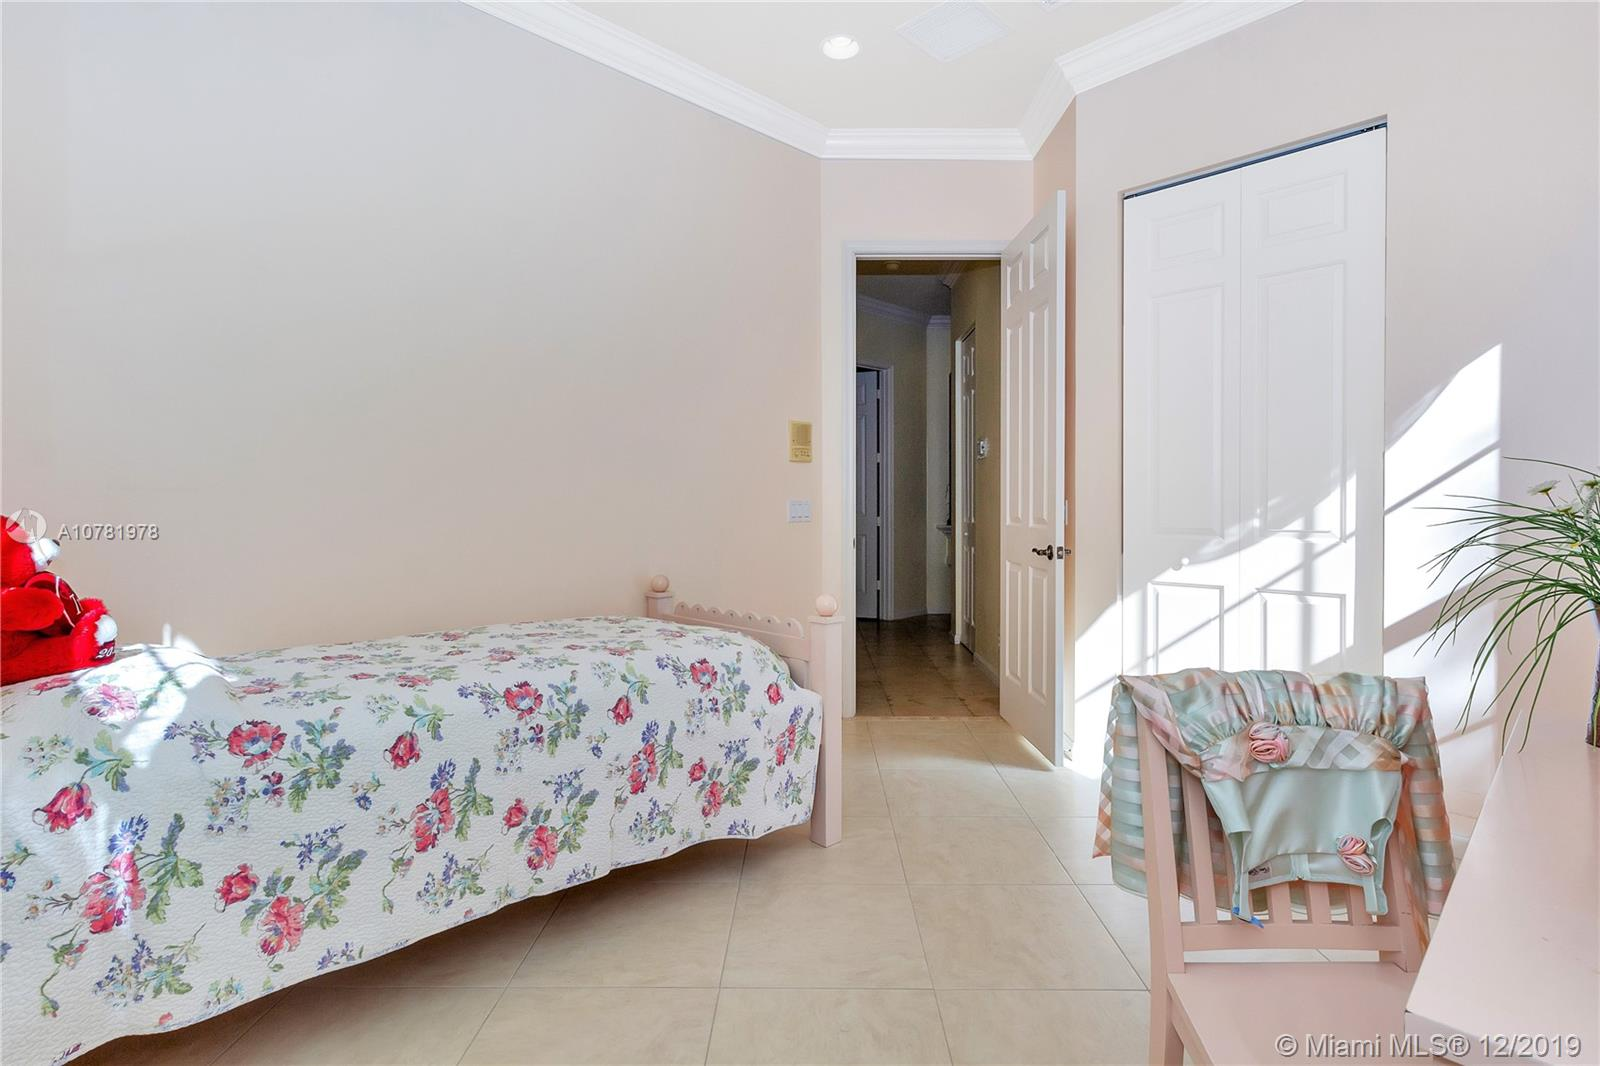 Homes for Sale in Zip Code 33472